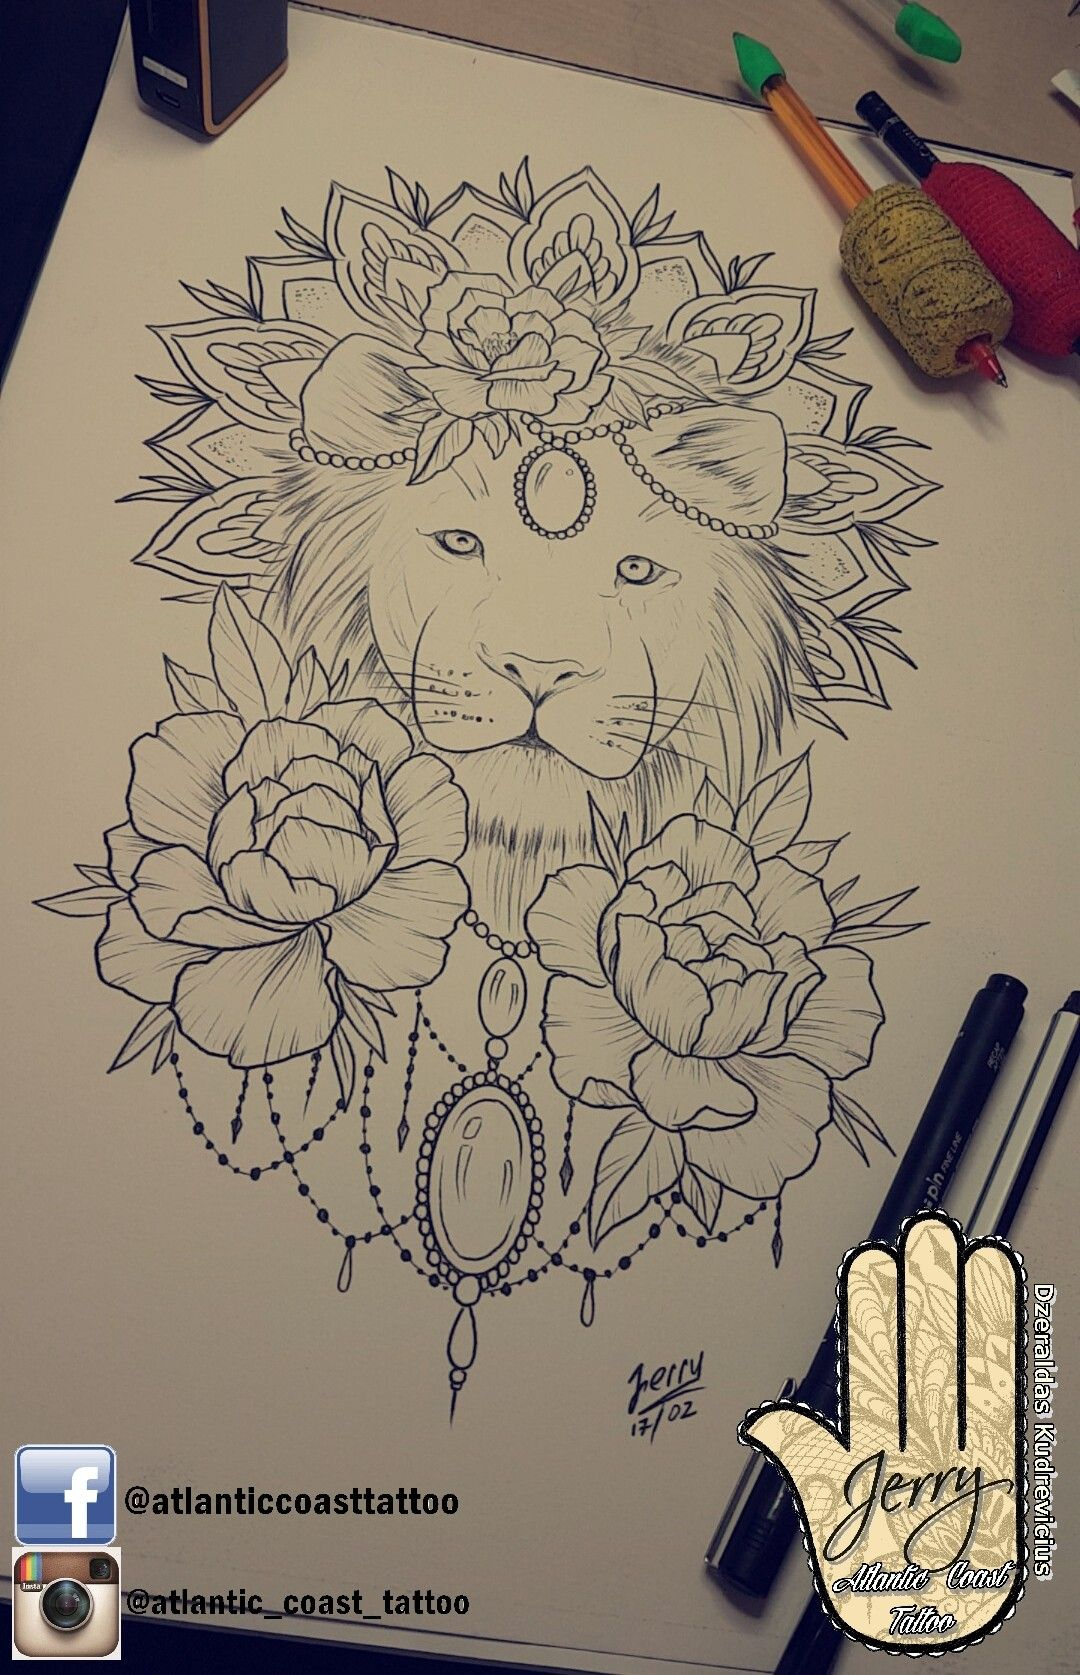 Beautiful Hand Thigh Lion Peonys Tattoo Ideas By Dzeraldas Jerry Kudrevicius From Atlantic Coast Tattoo Mandala Lotus R Lion Mandala Symbolic Tattoos Tattoos